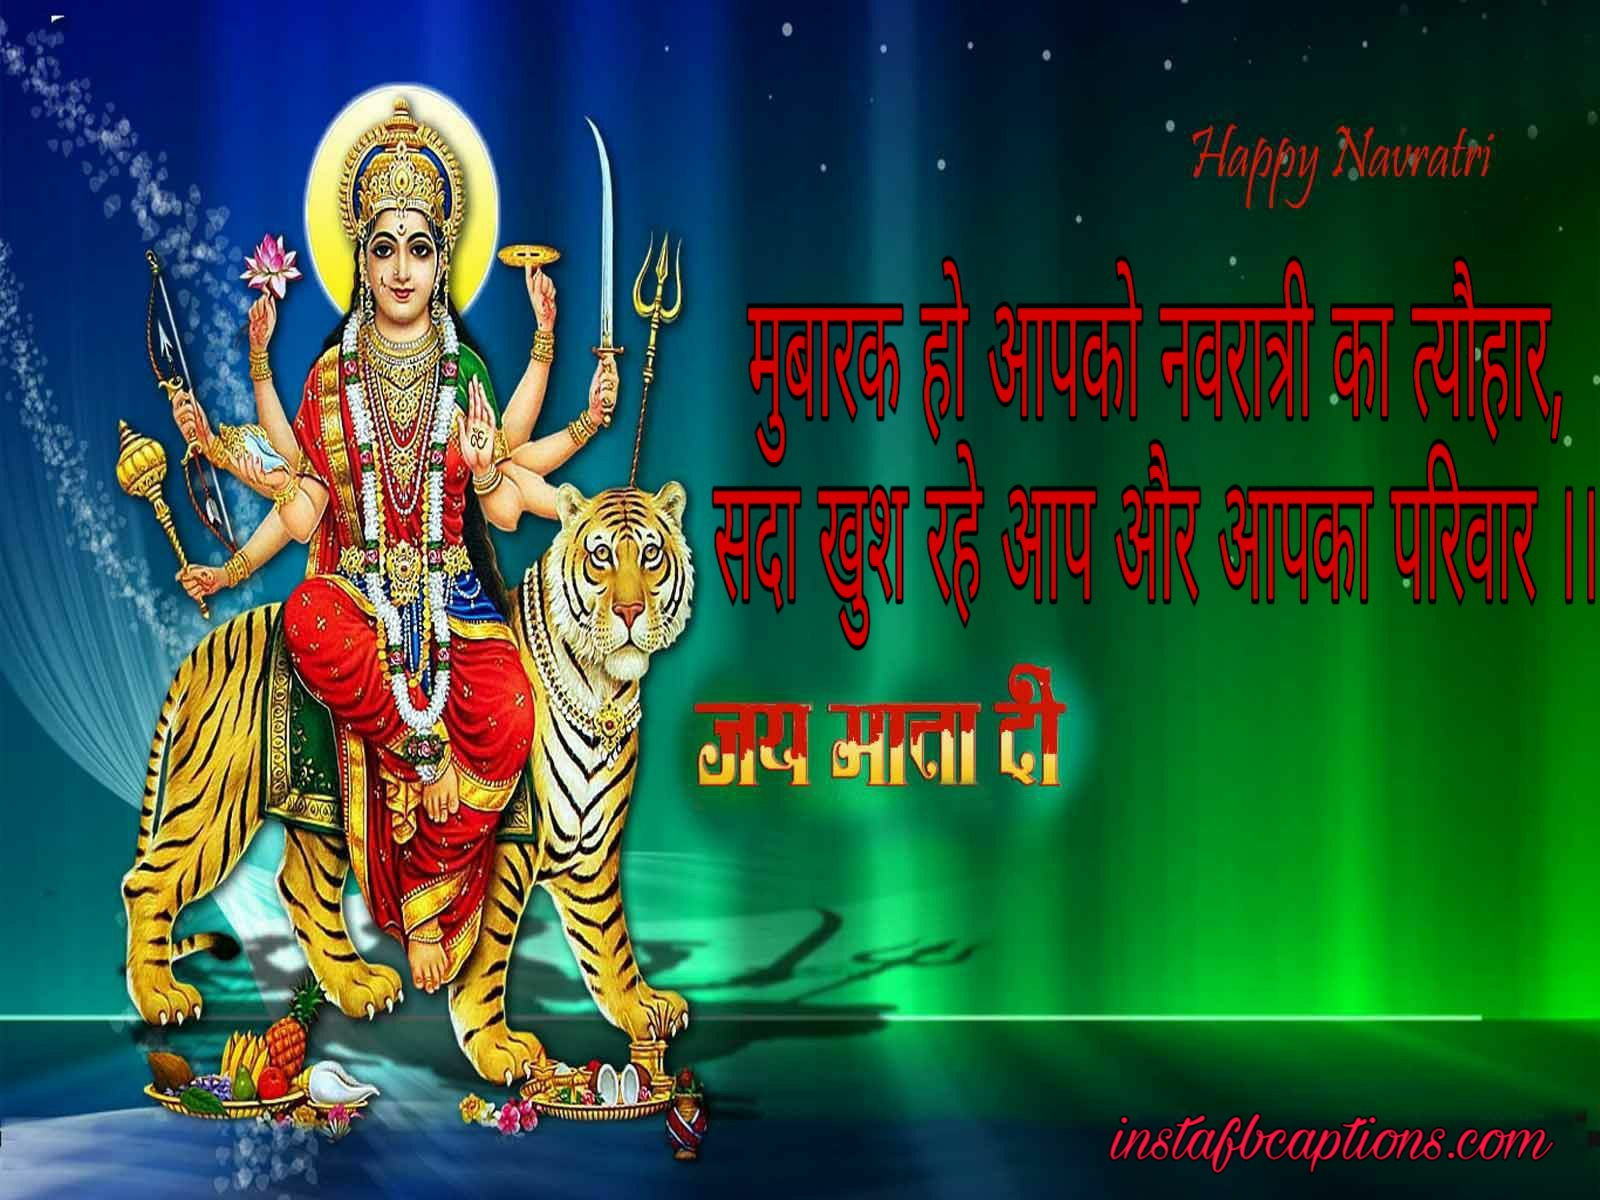 Hindi Navratri Captions  - PicsArt 07 03 08 - 120+ Navratri Quotes, Wishes, and Instagram Captions